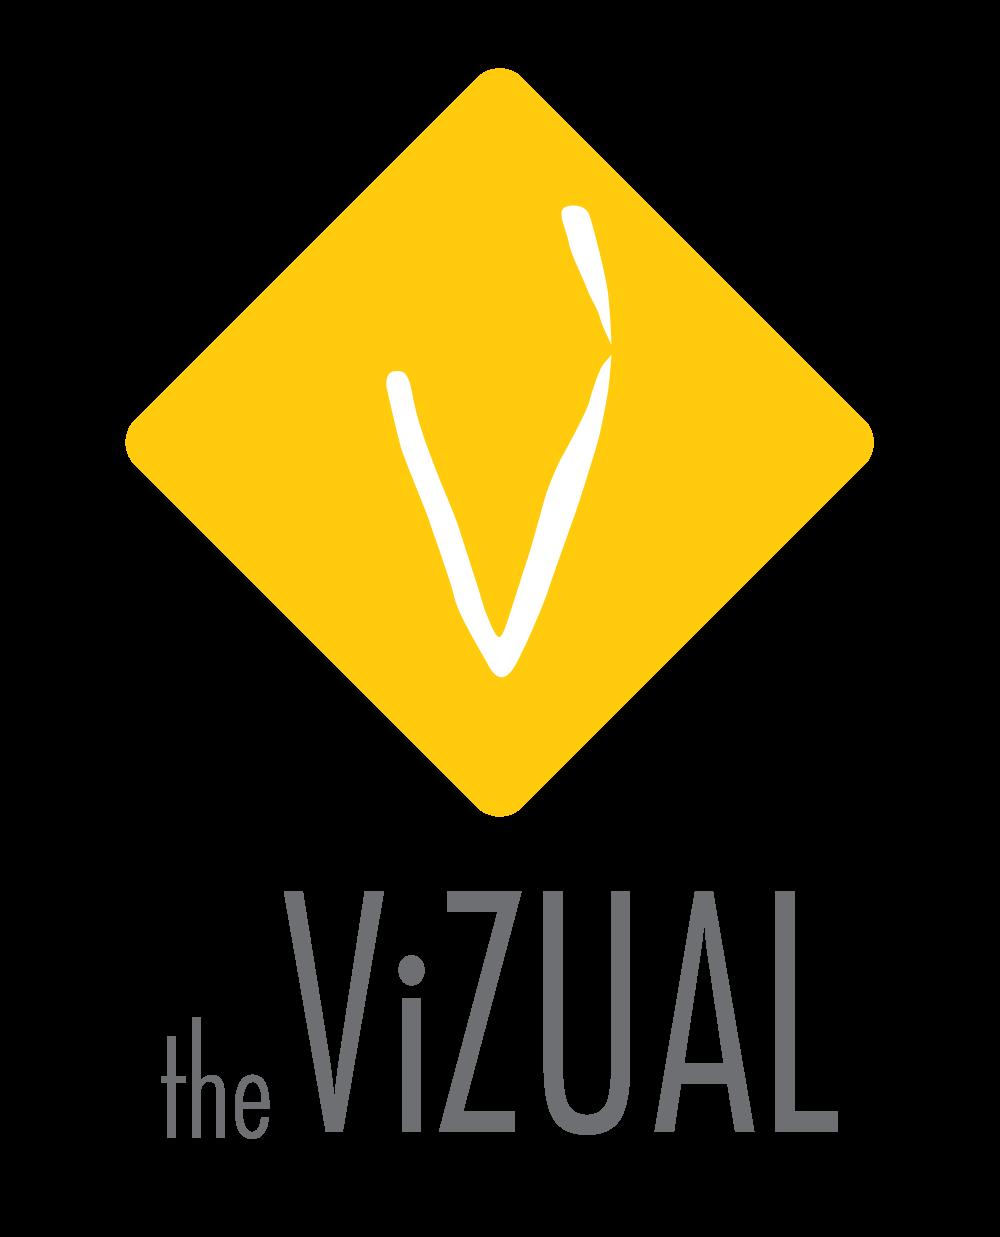 THE VIZUAL